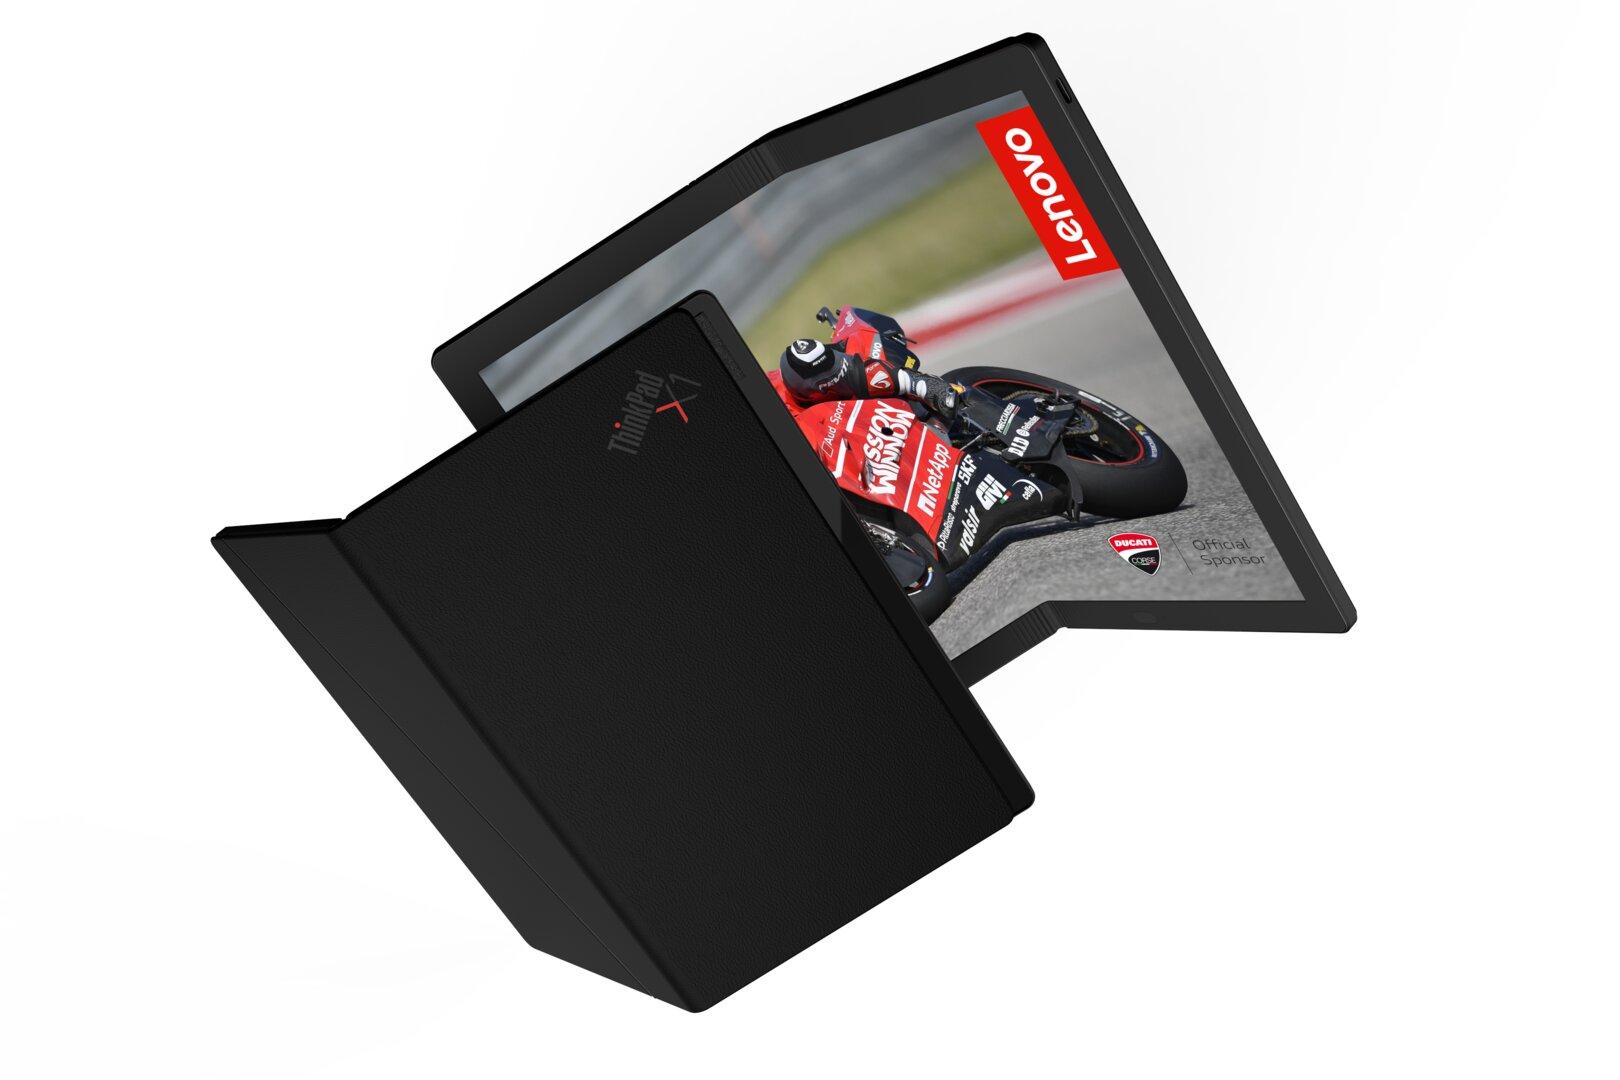 Faltbares ThinkPad X1